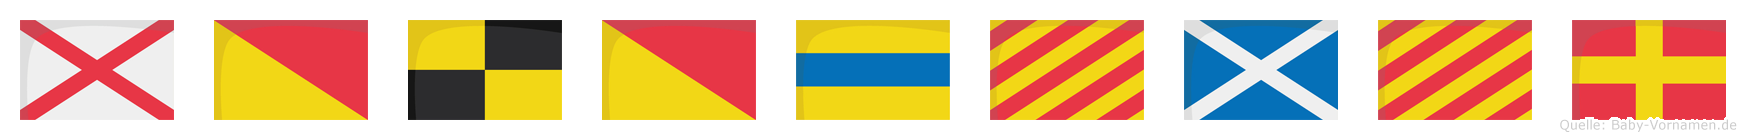 Volodymyr im Flaggenalphabet